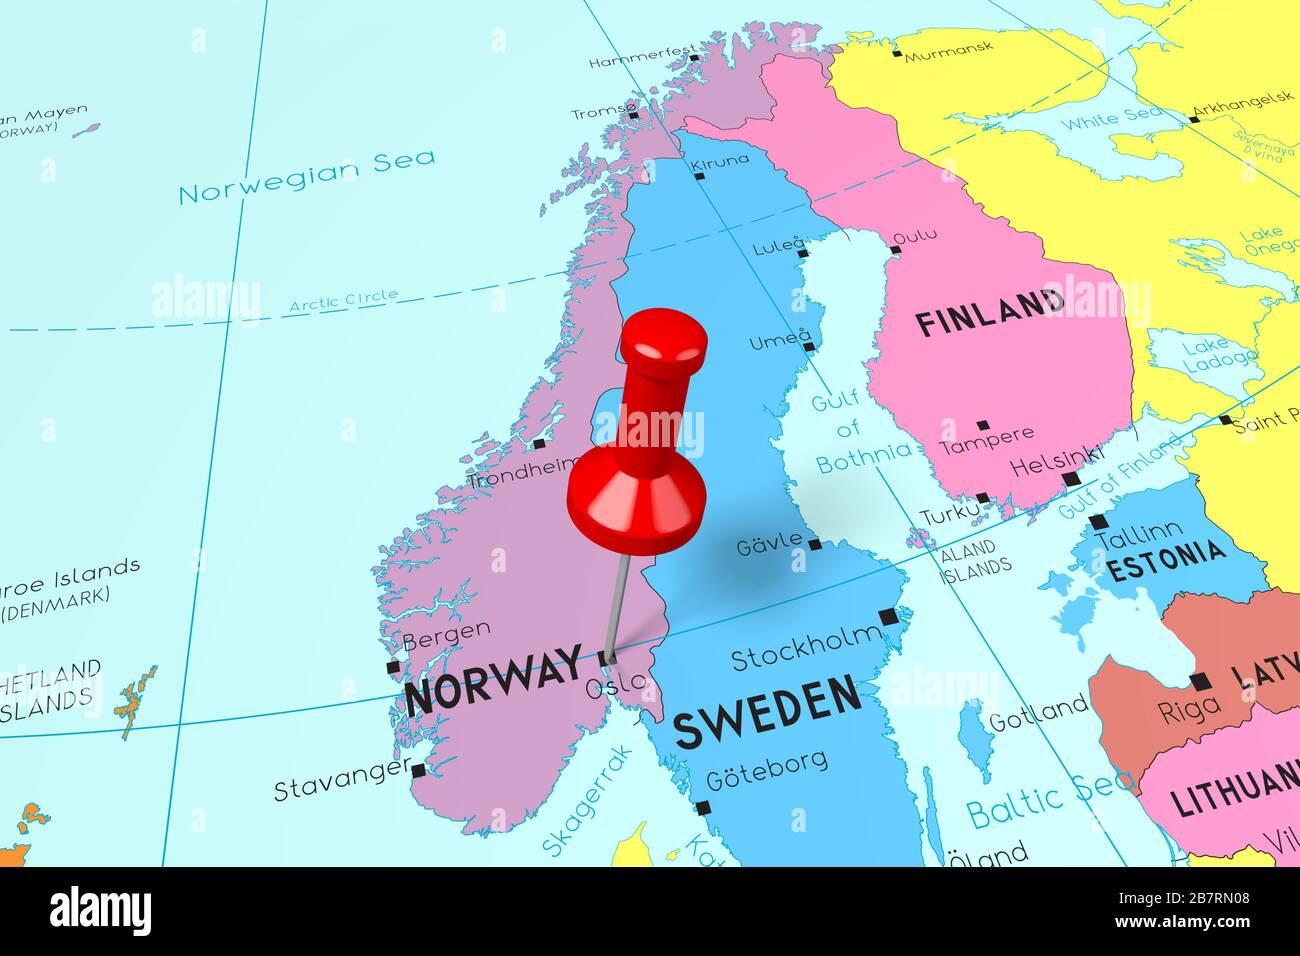 Cartina Norvegia Politica.Norway Map Immagini E Fotos Stock Alamy